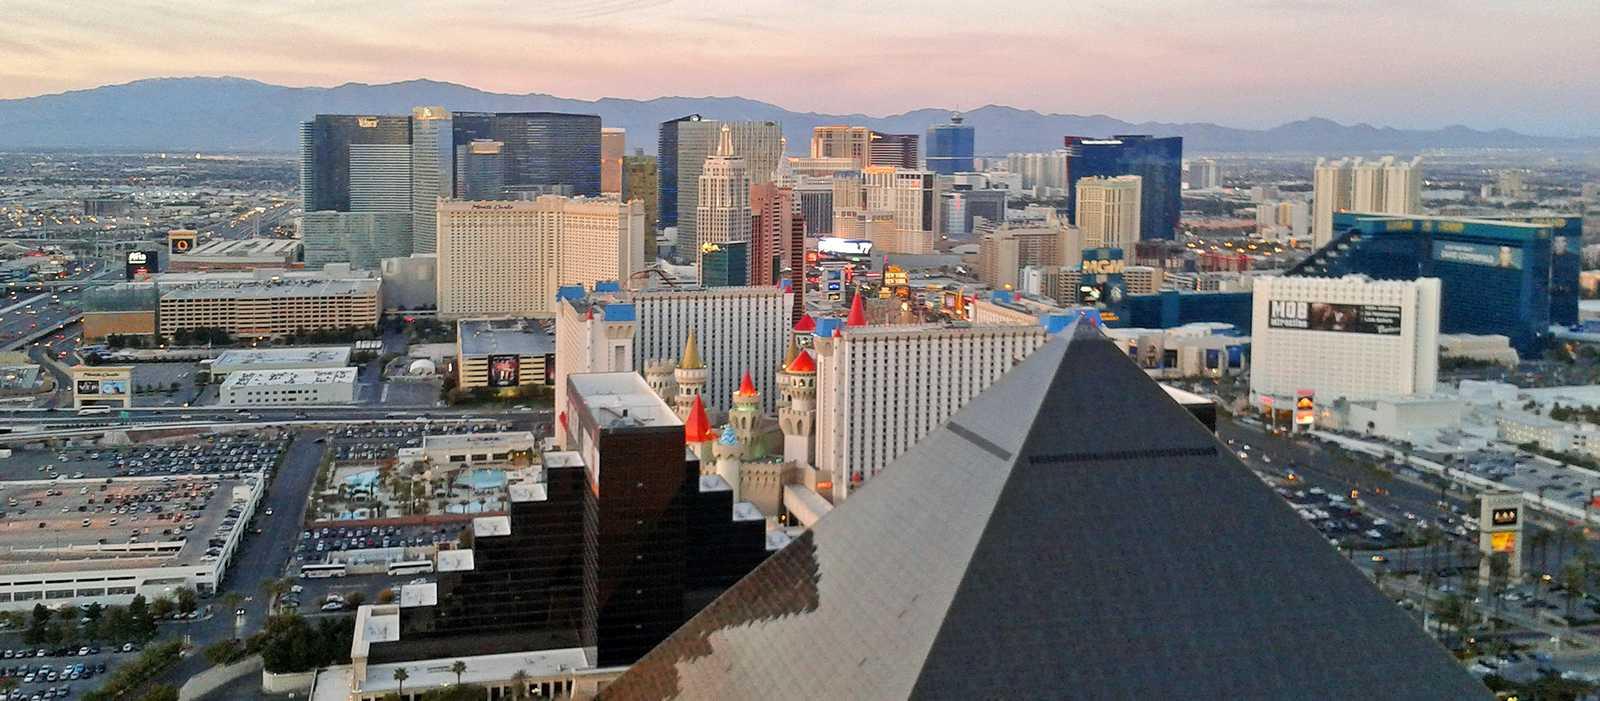 Blick über den Las Vegas Strip